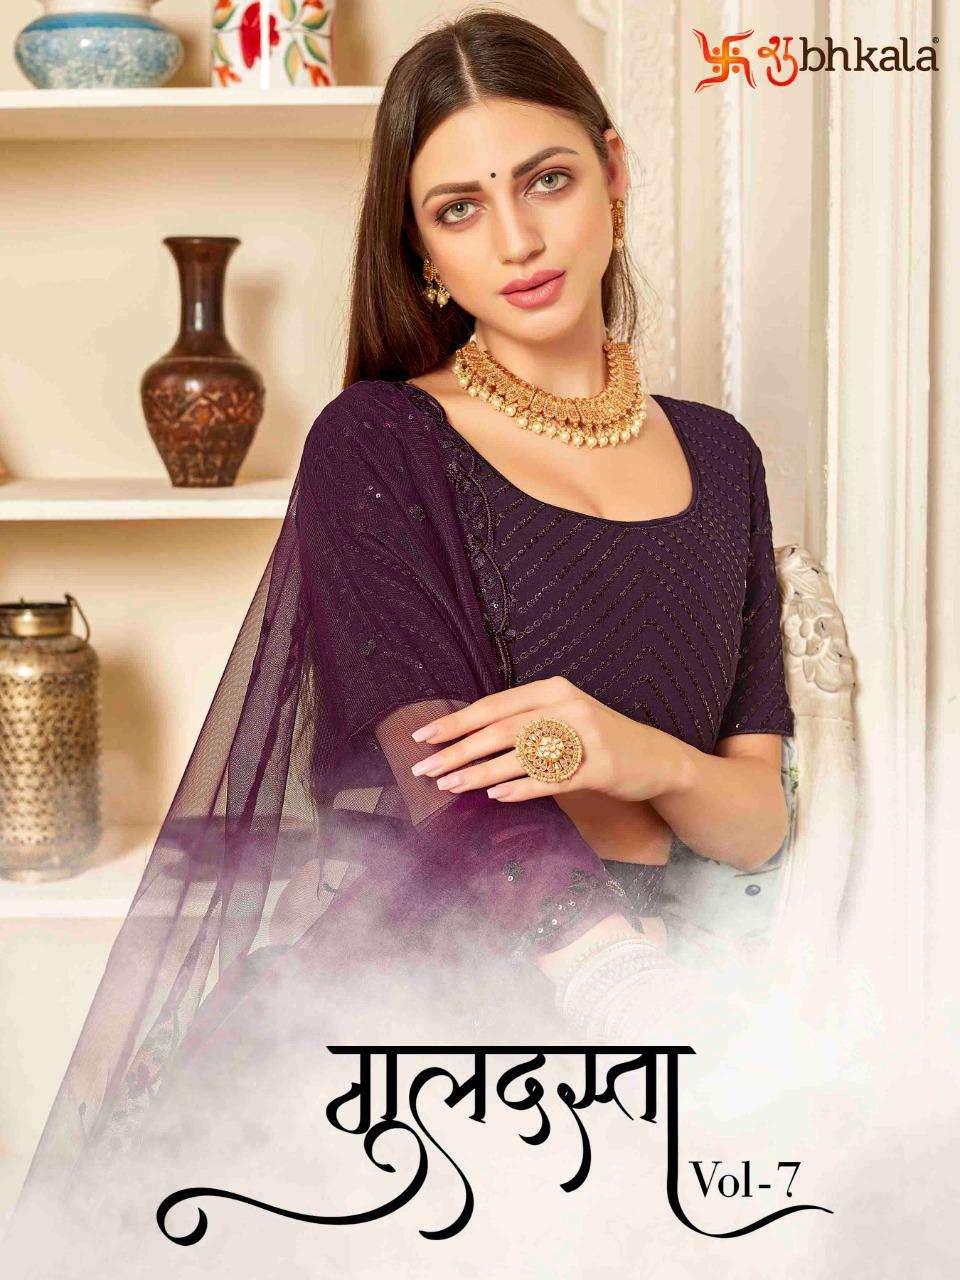 Shubhkala Guldasta Vol 7 By Khushboo Fancy Semi Stitched Lehenga Choli Collection